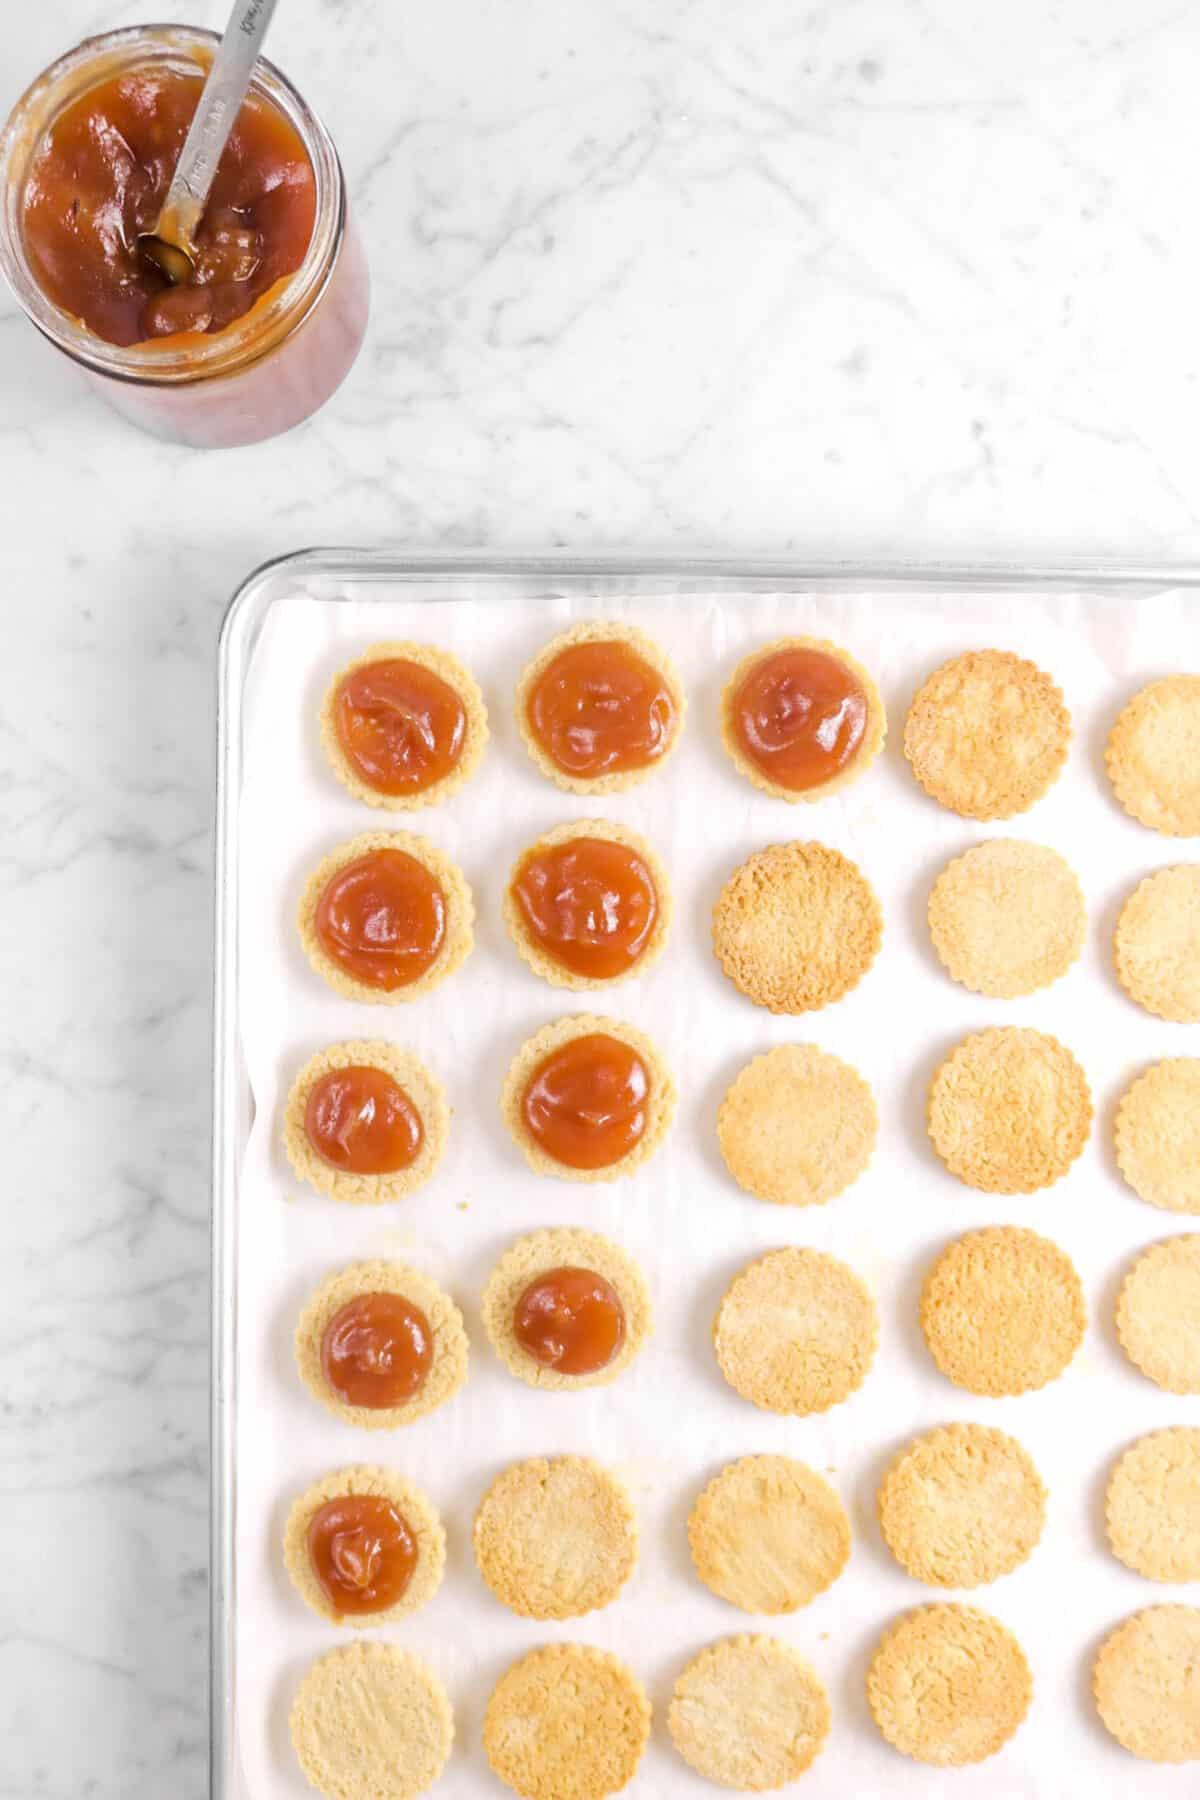 ten cookies with apple butter spooned on top